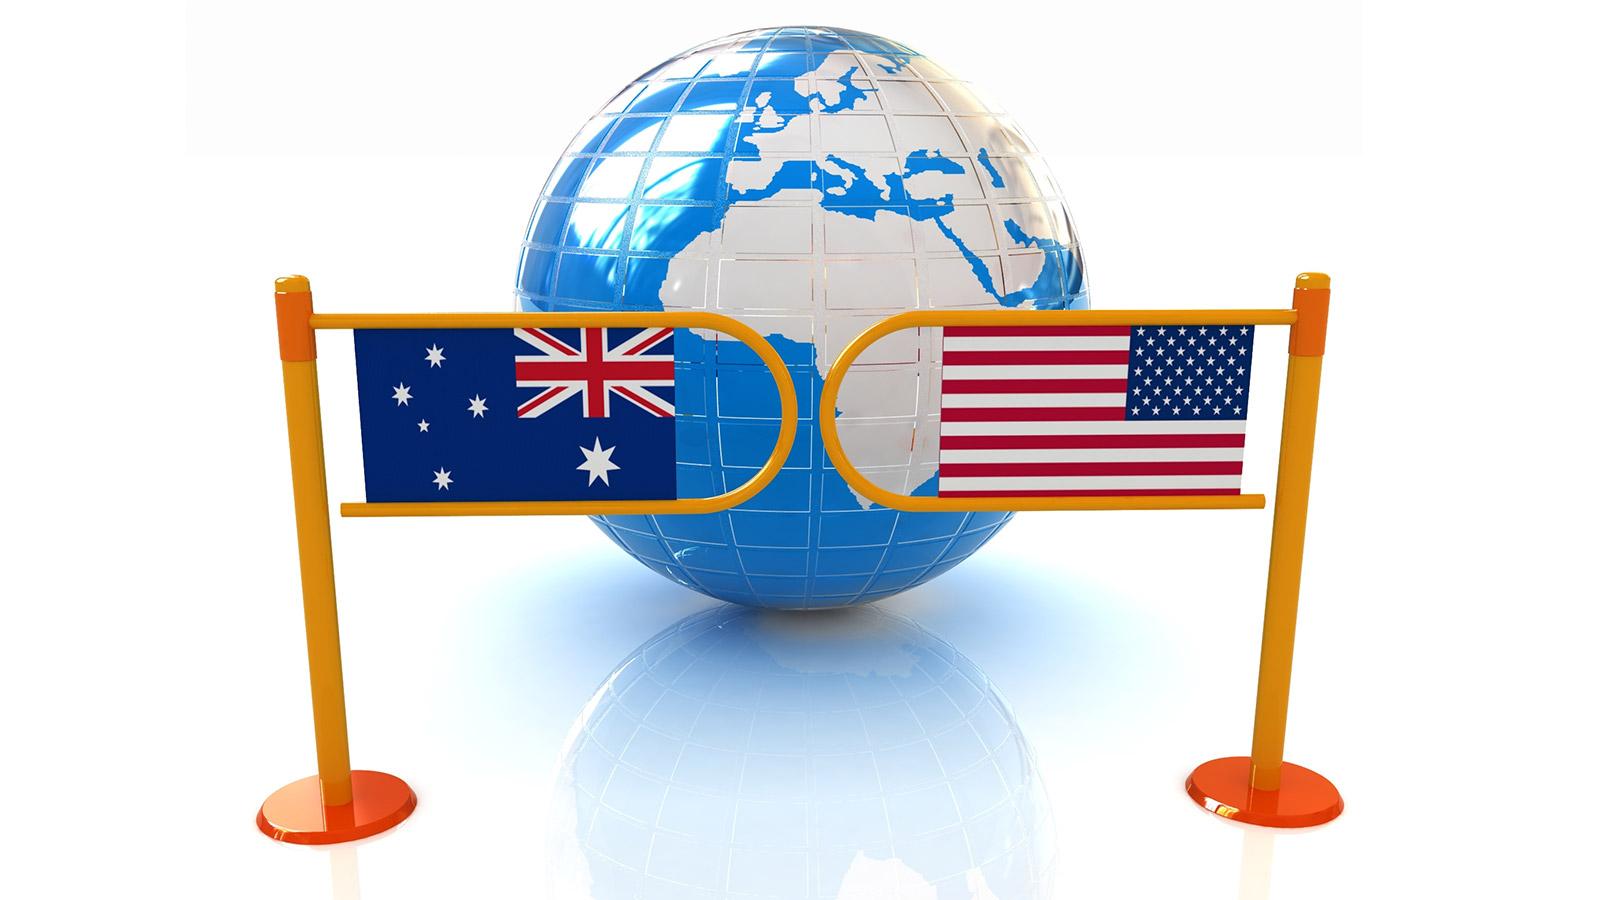 U.S. and Australia flags and globe